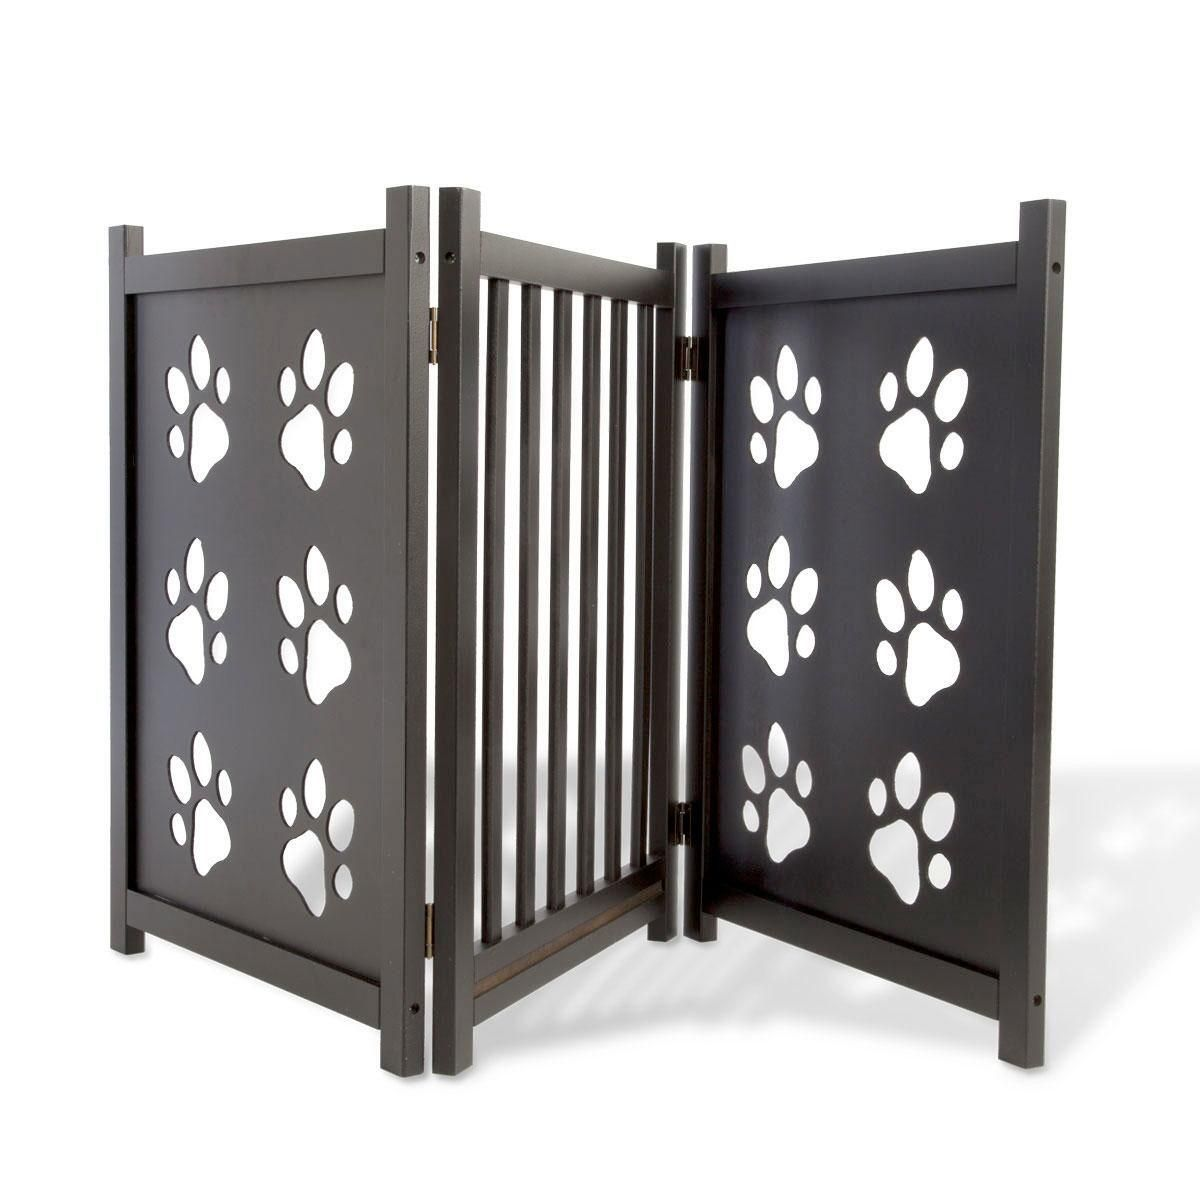 Pawprints Pet Wooden Gate